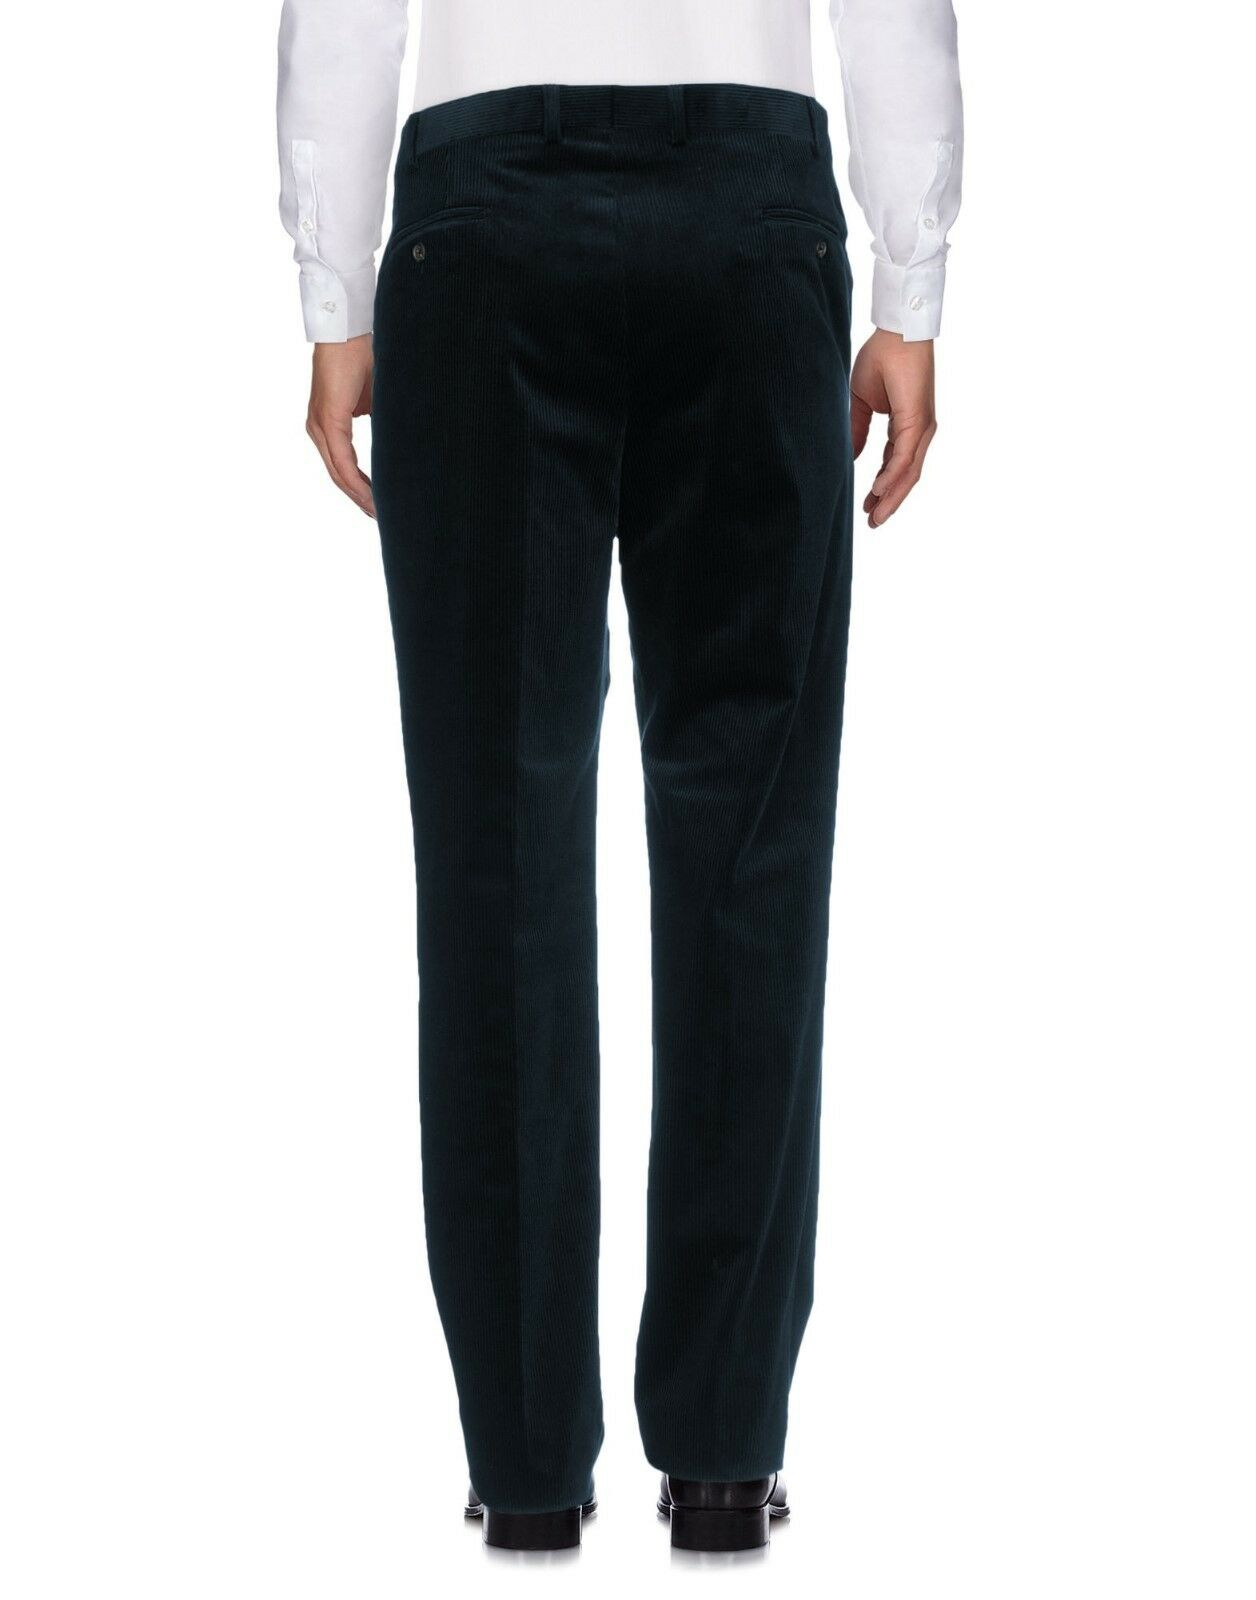 Pal Zileri Pull Men's Dark Blau Double Pleated Corduroy Pants Trousers - W41 L33